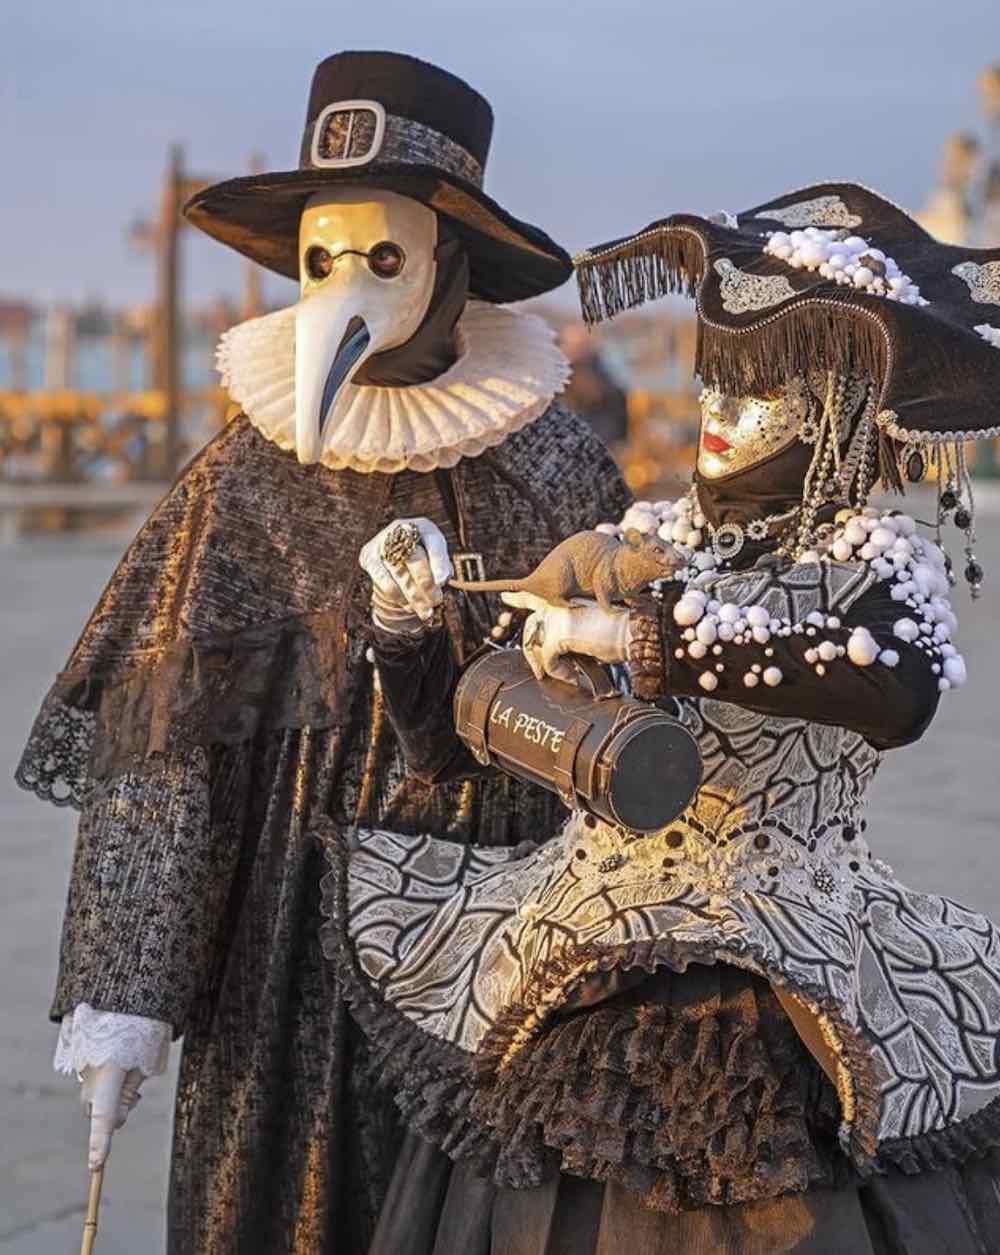 Plague Doctor mask at Venice Carnival - Photo via IG @josepmasalles